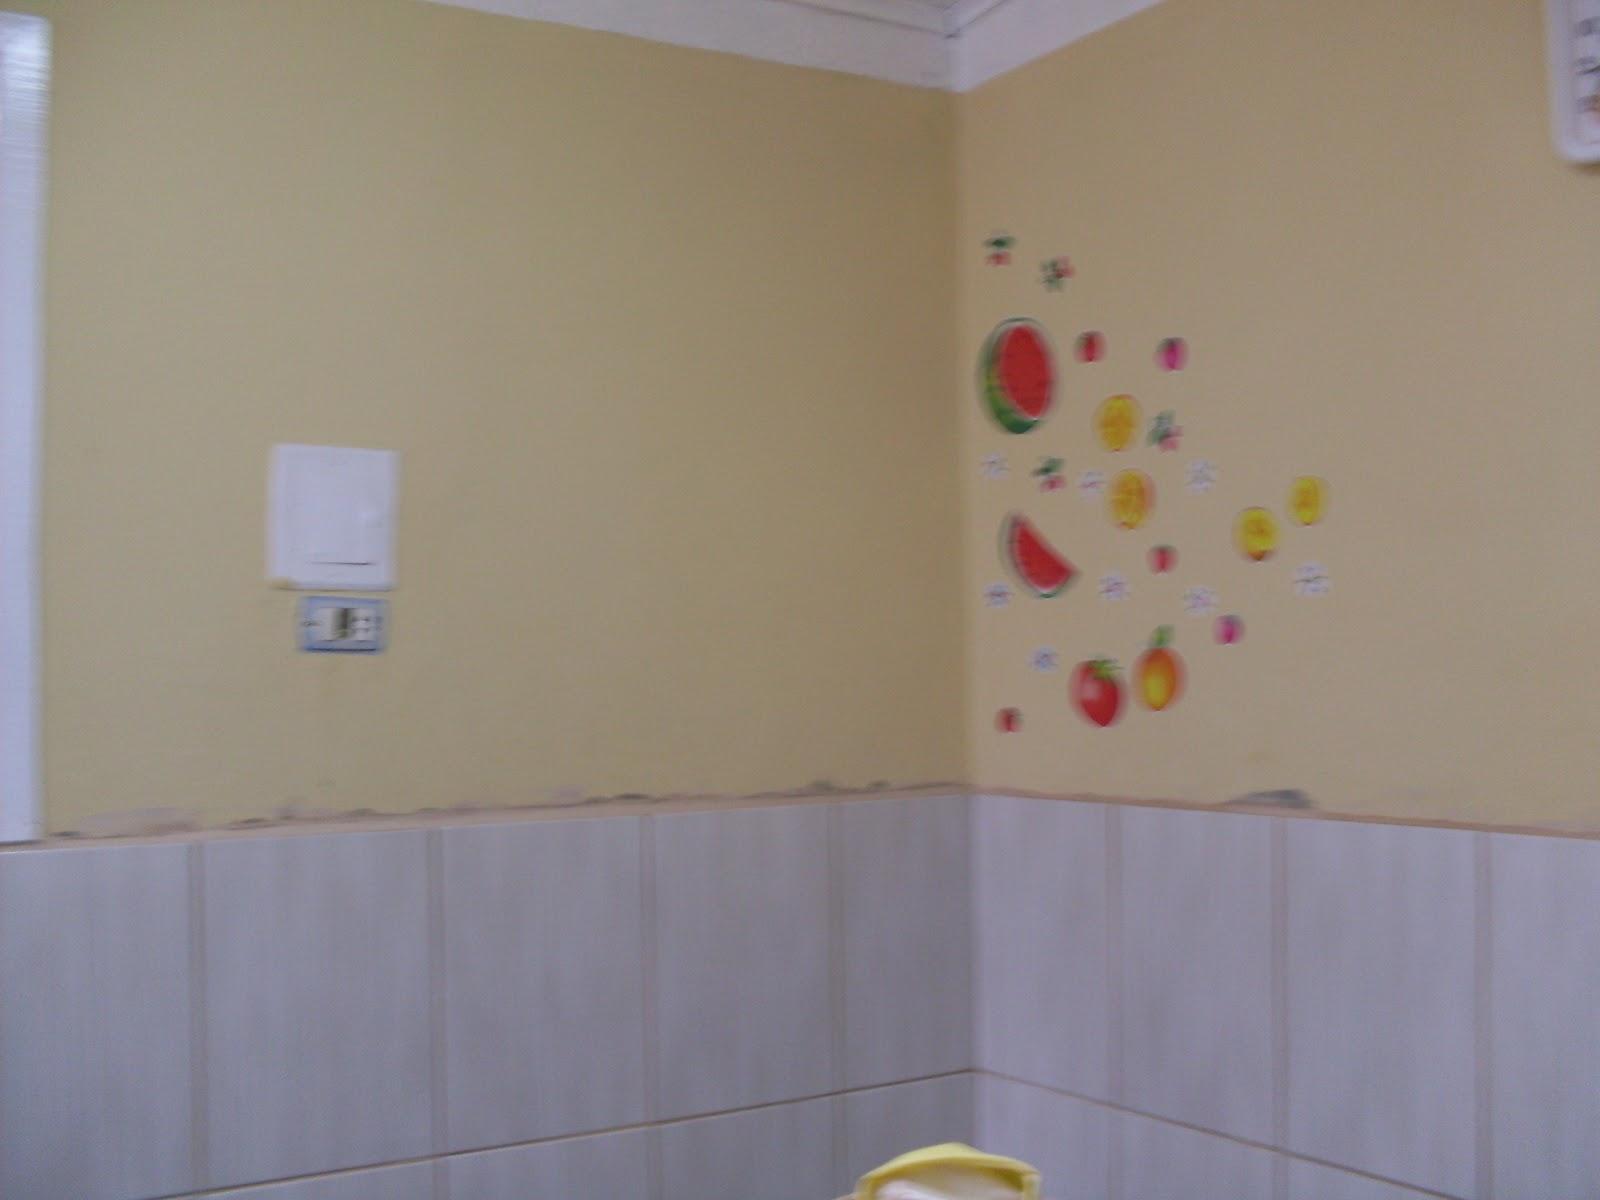 Reformas Boaventura: REVESTIMENTO E GRAFIATO #8A3533 1600x1200 Banheiro Com Revestimento E Grafiato